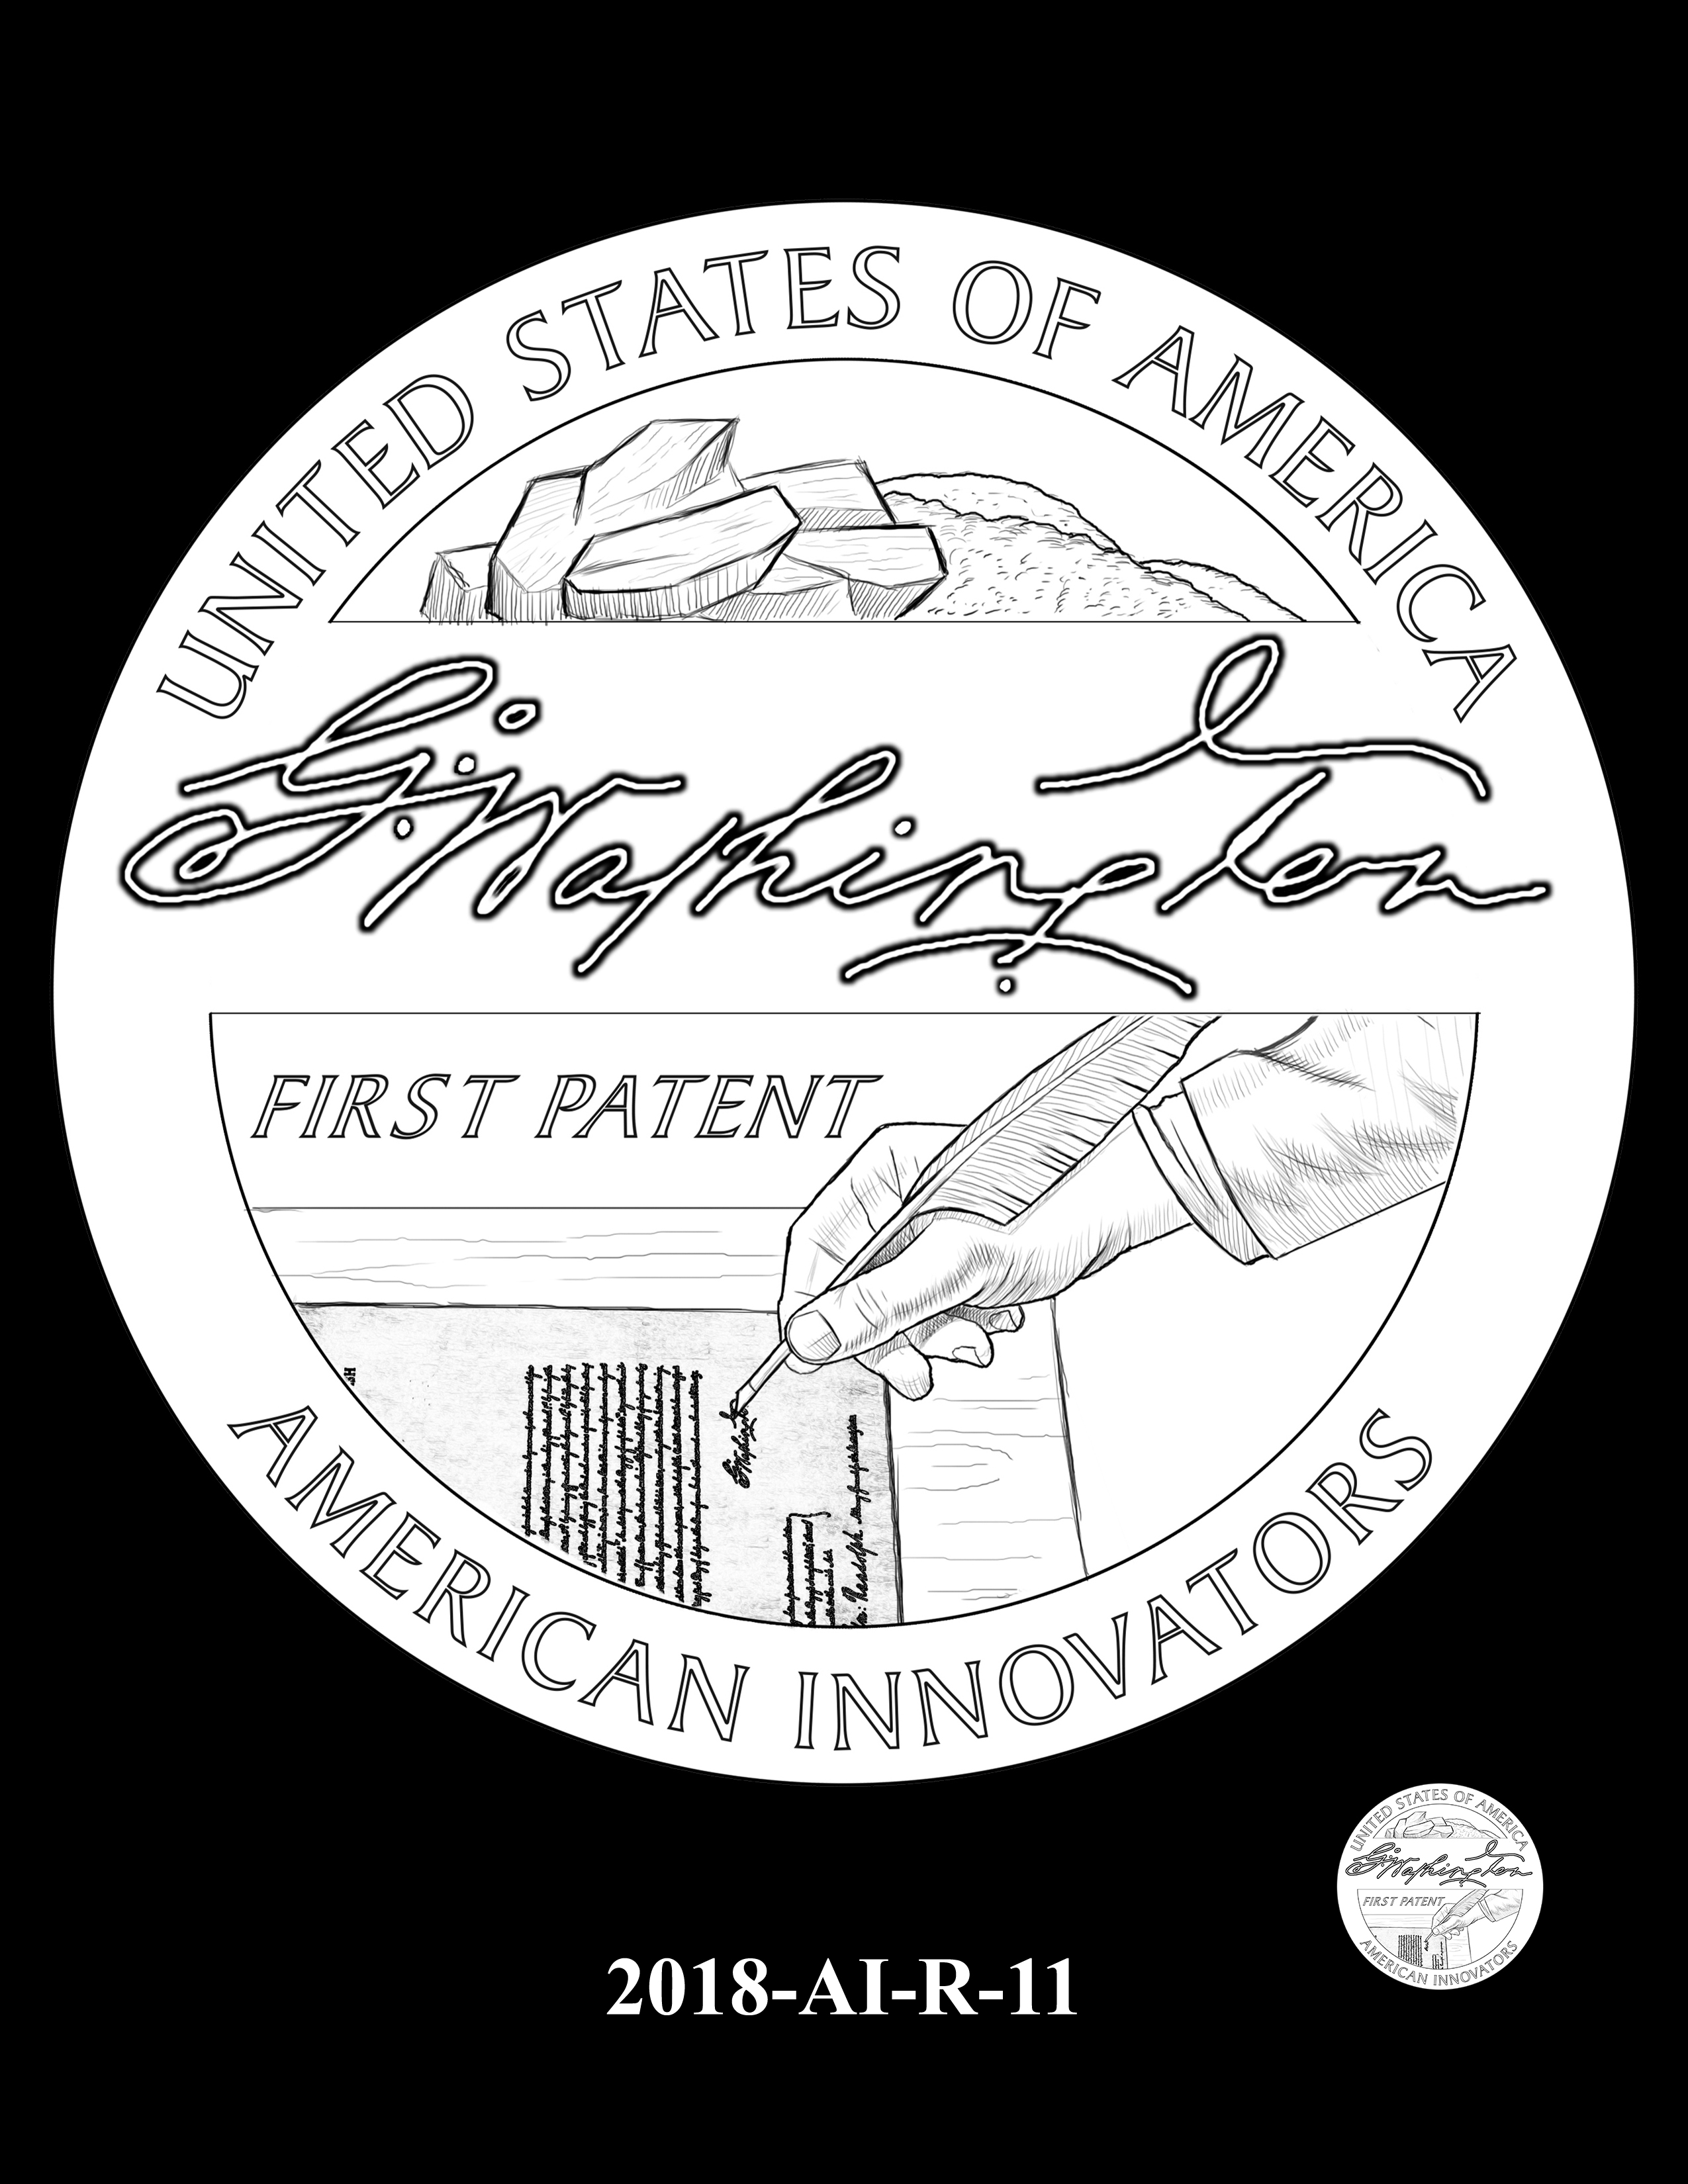 2018-AI-R-11 -- 2018 American Innovation $1 Coin